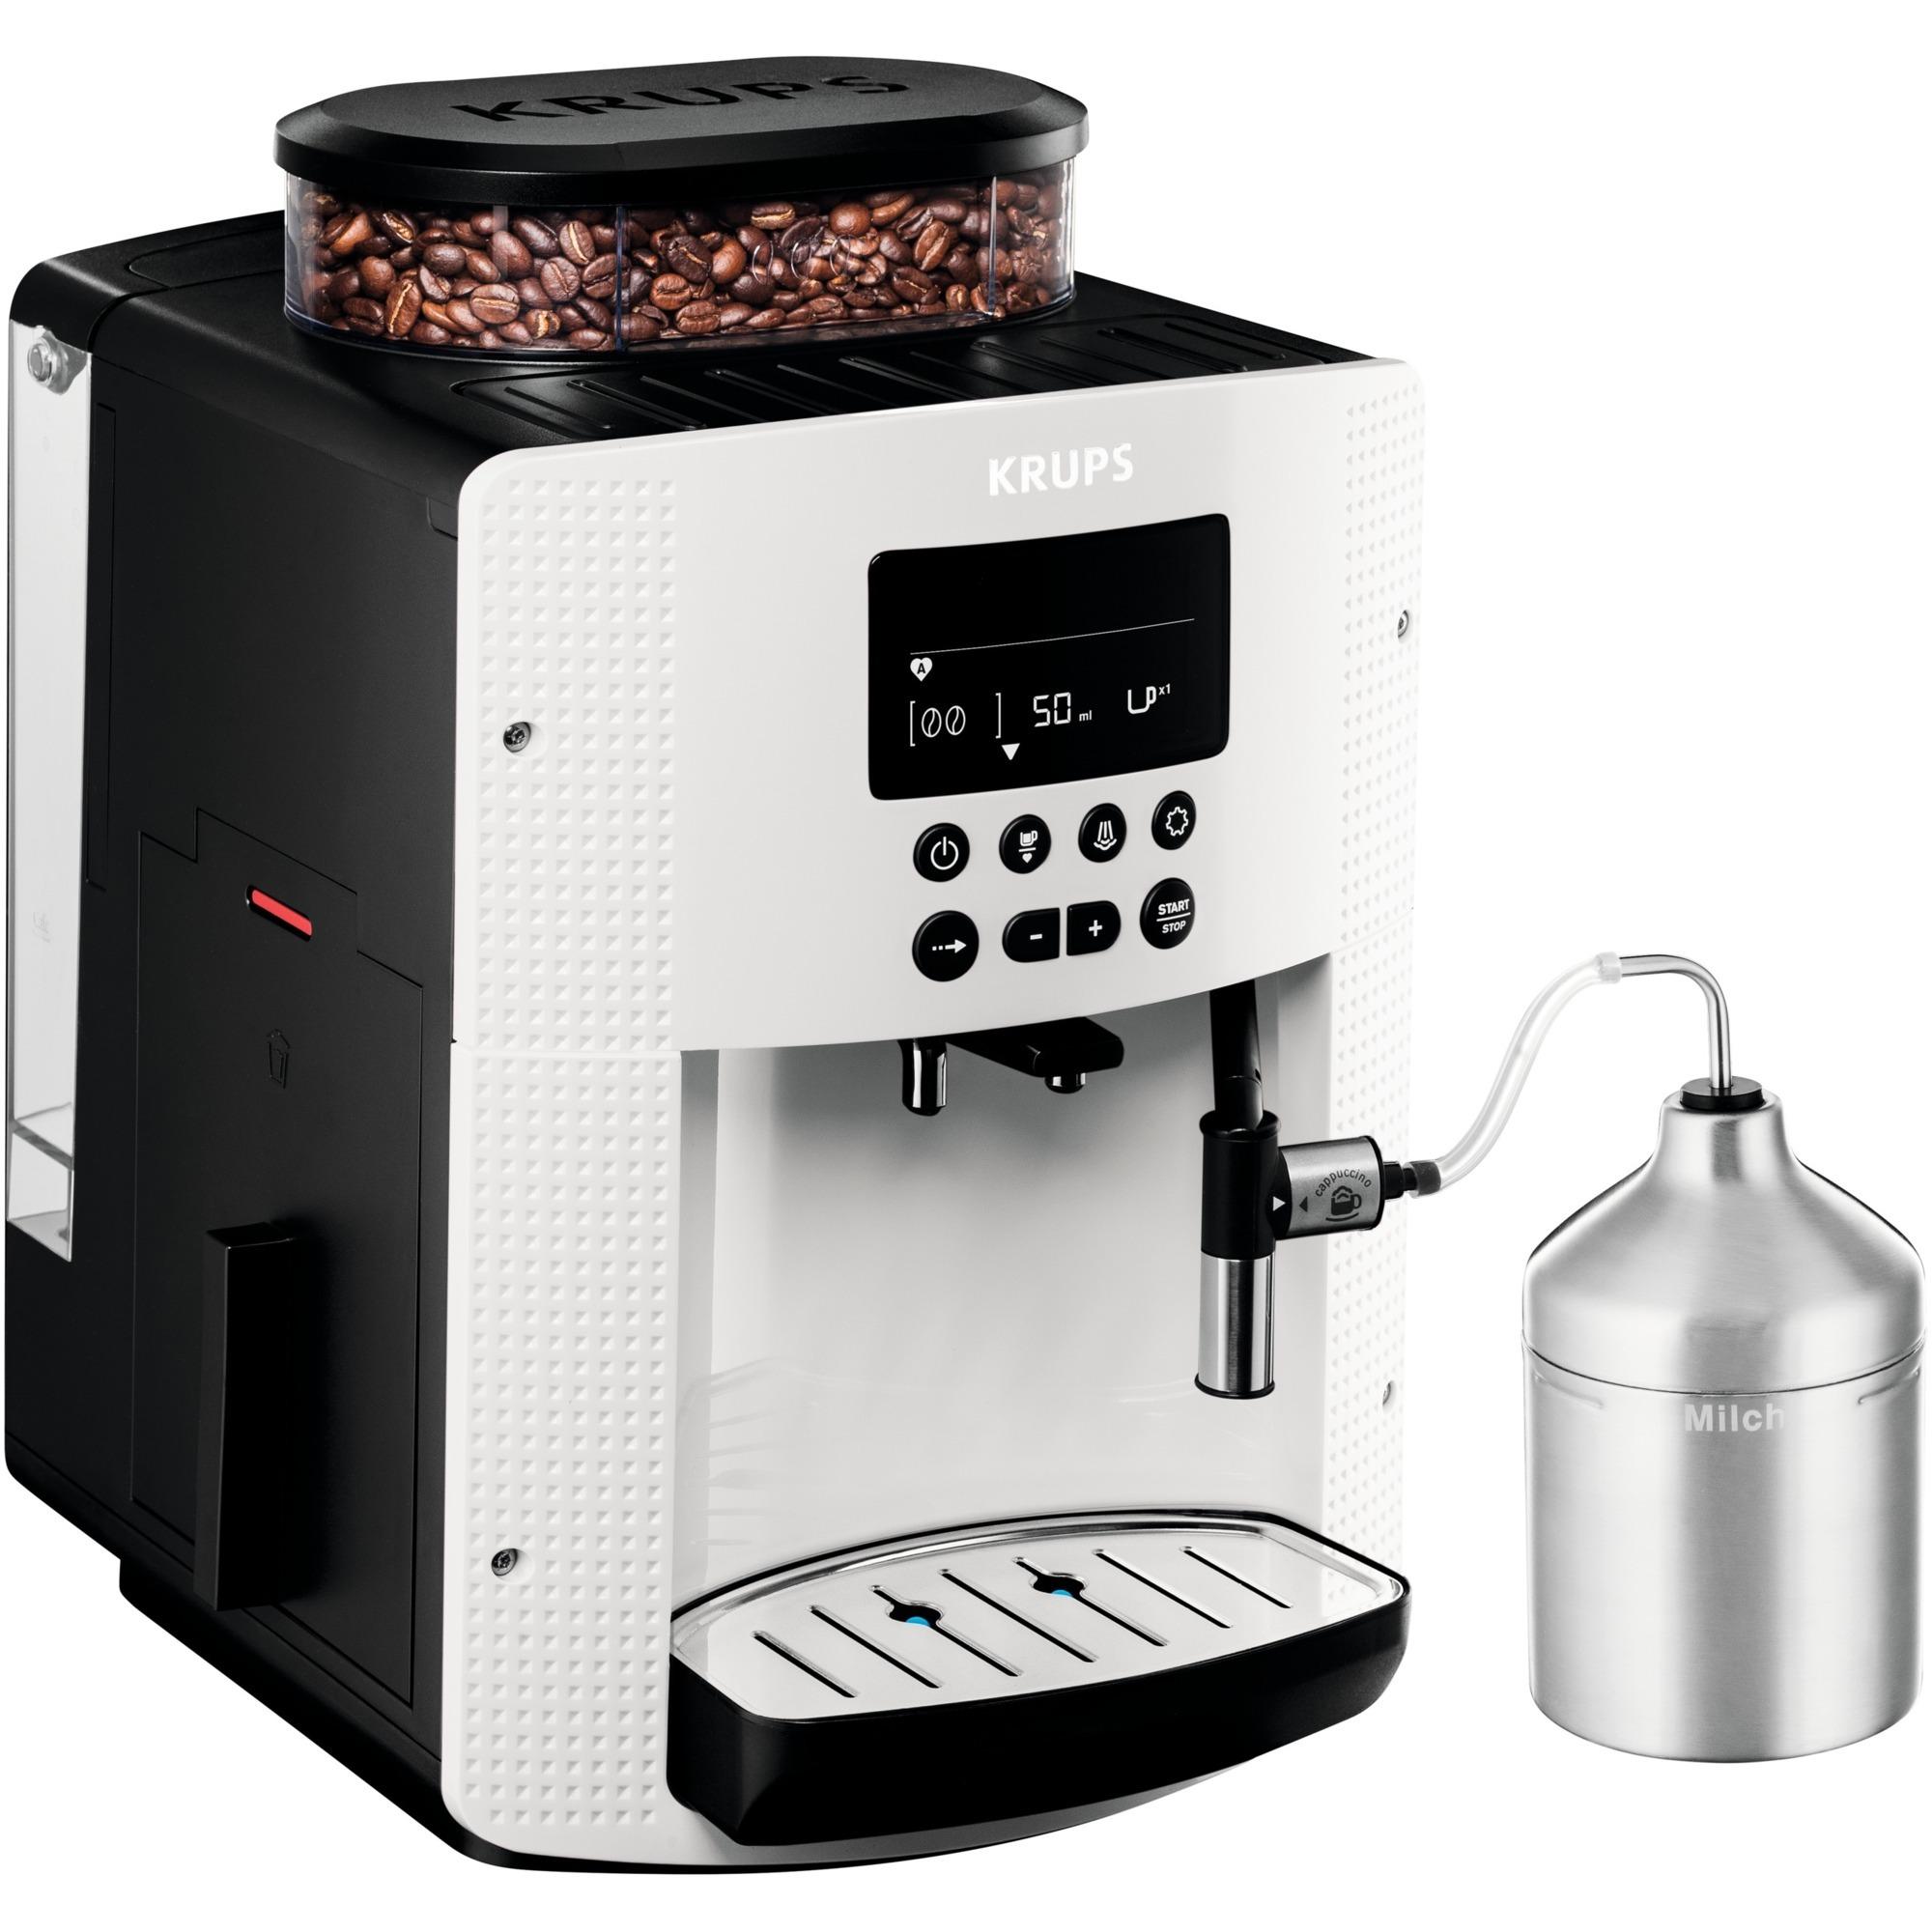 EA 8161 Independiente Máquina espresso 1,8 L Totalmente automática, Superautomática